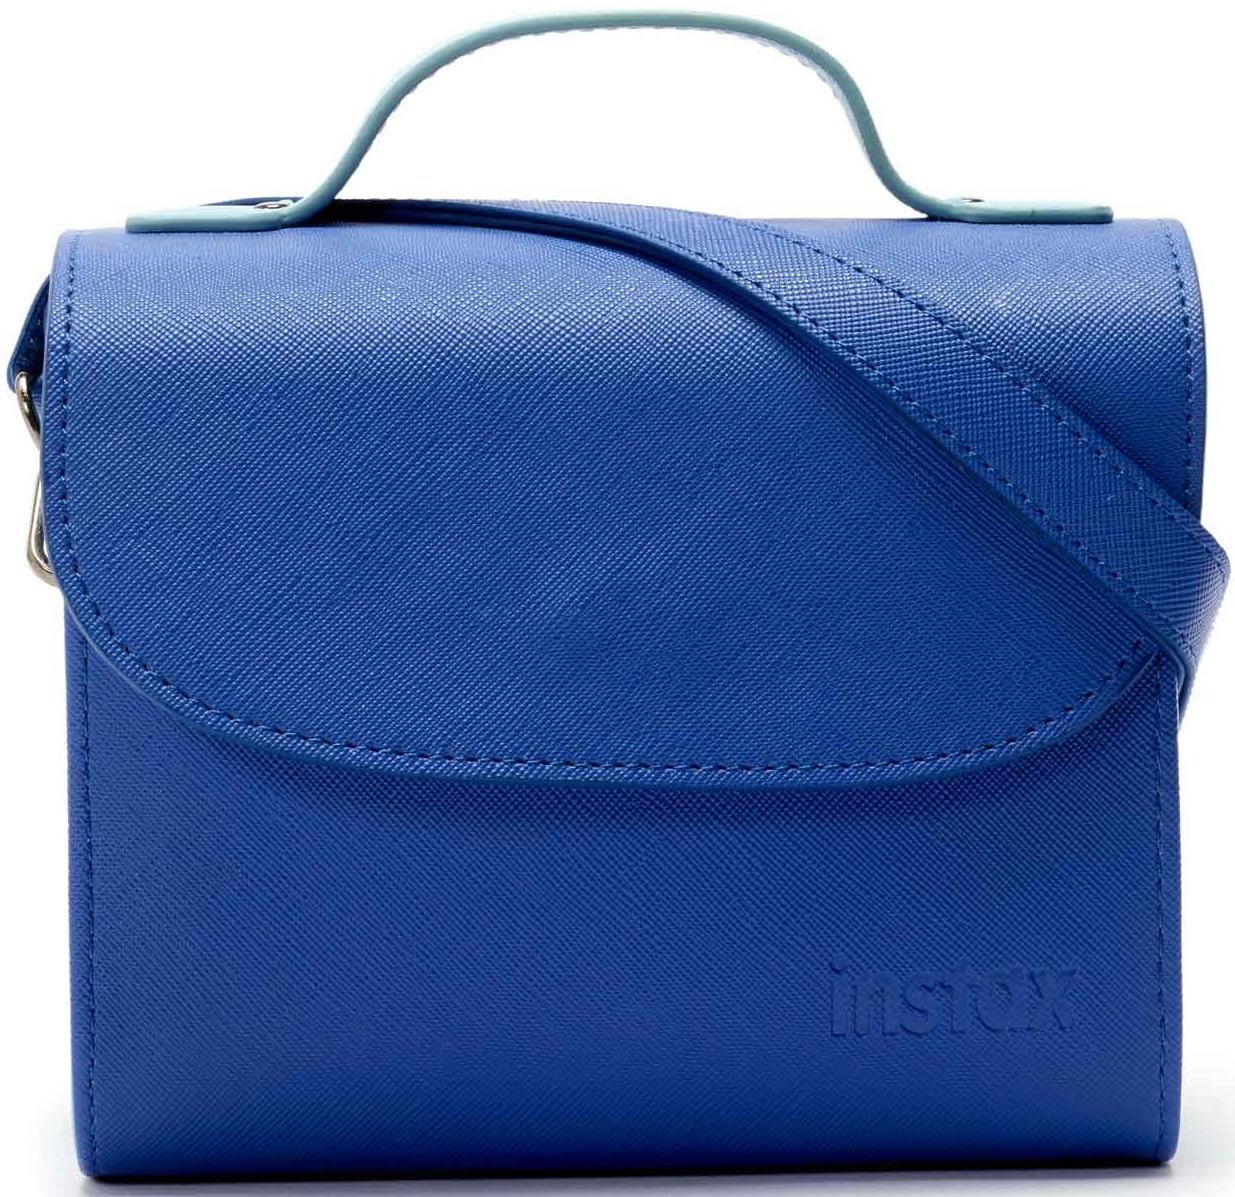 FUJIFILM INSTAX  brašna pro MINI 9 - tmavě modrý